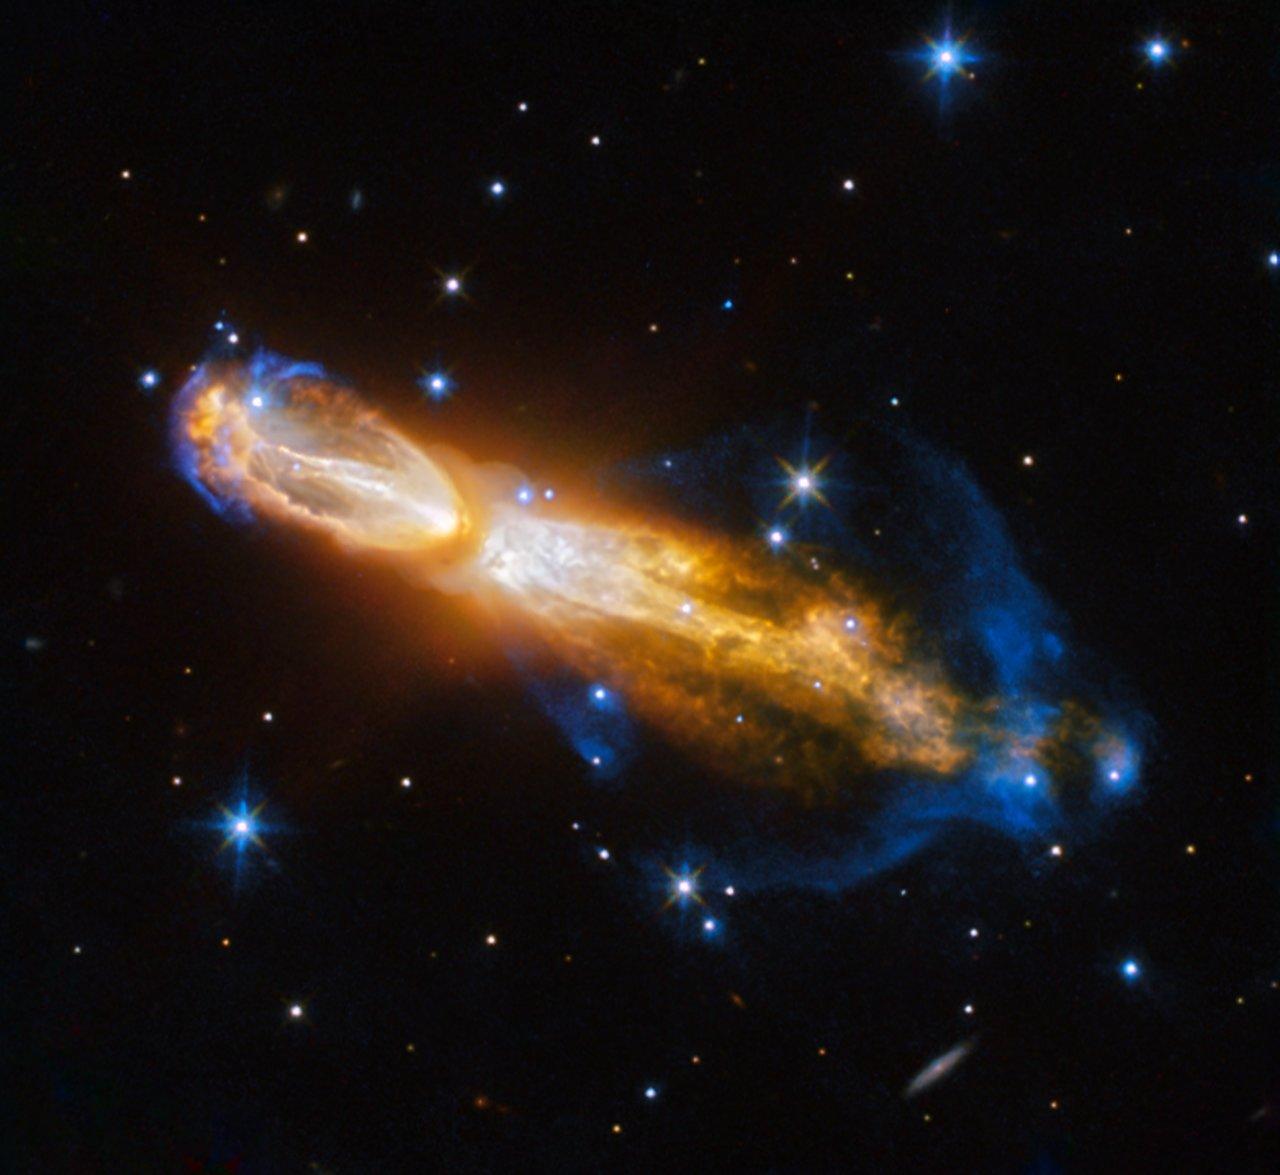 Calabash Nebula! Image credit: Hubble/NASA/STScI/JPL